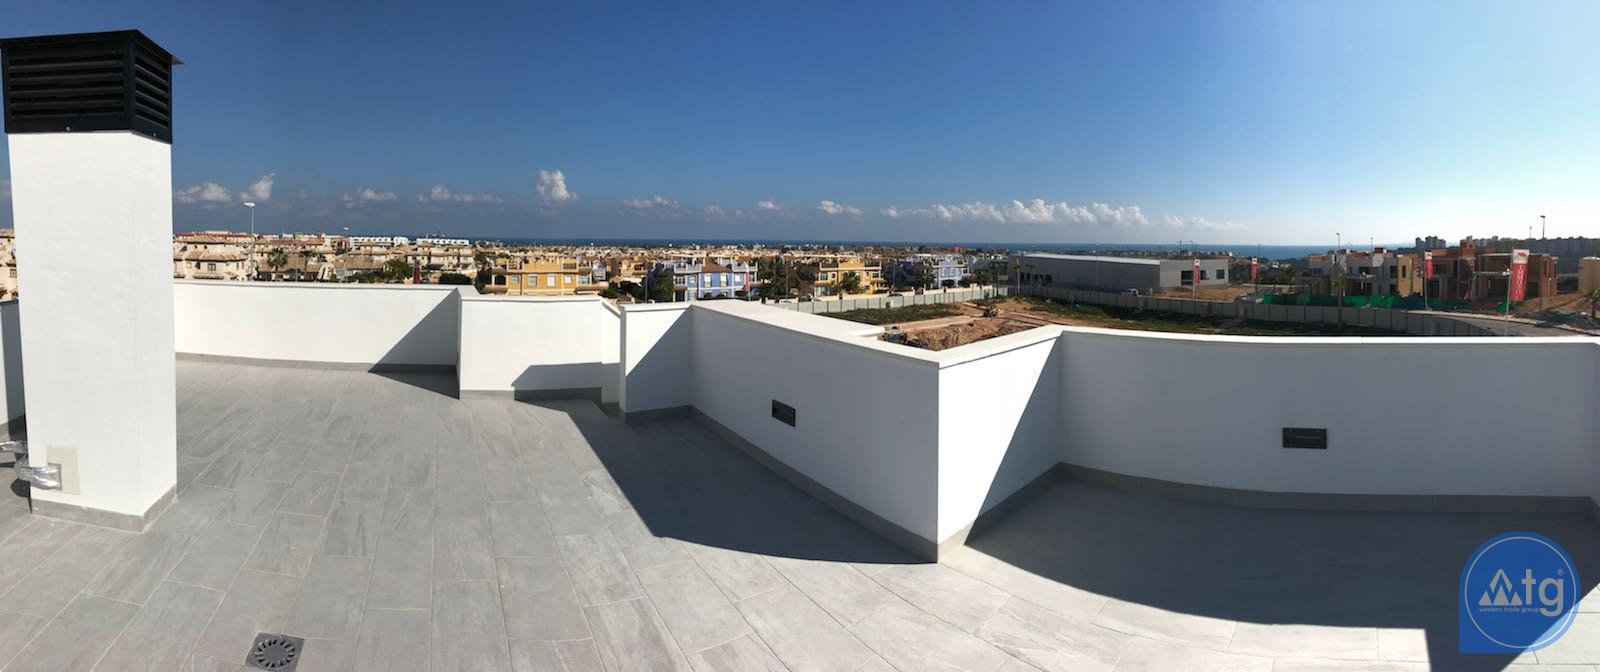 3 bedroom Villa in La Zenia  - IM116755 - 9